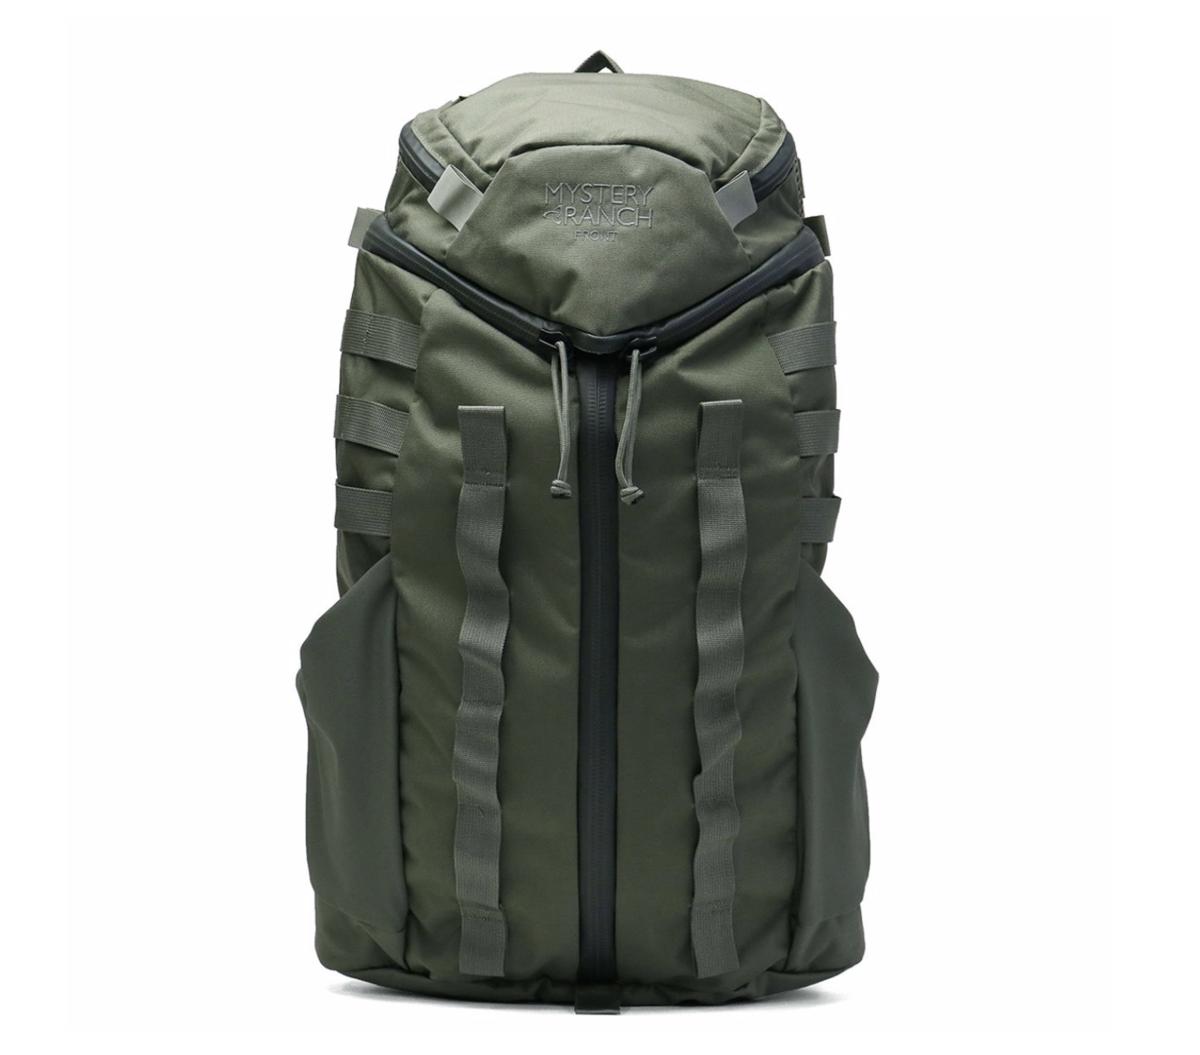 f:id:thebackpack:20190802203038p:plain